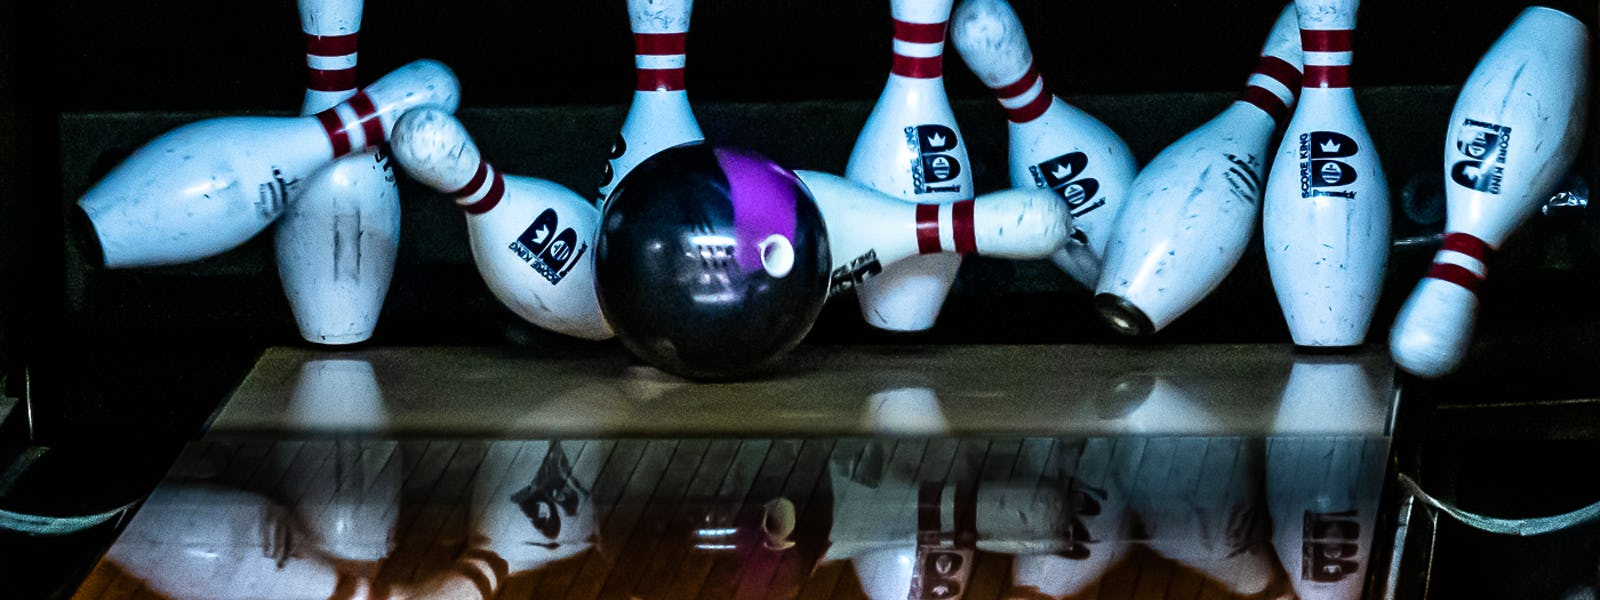 Bild - 6-18 år: Bowling